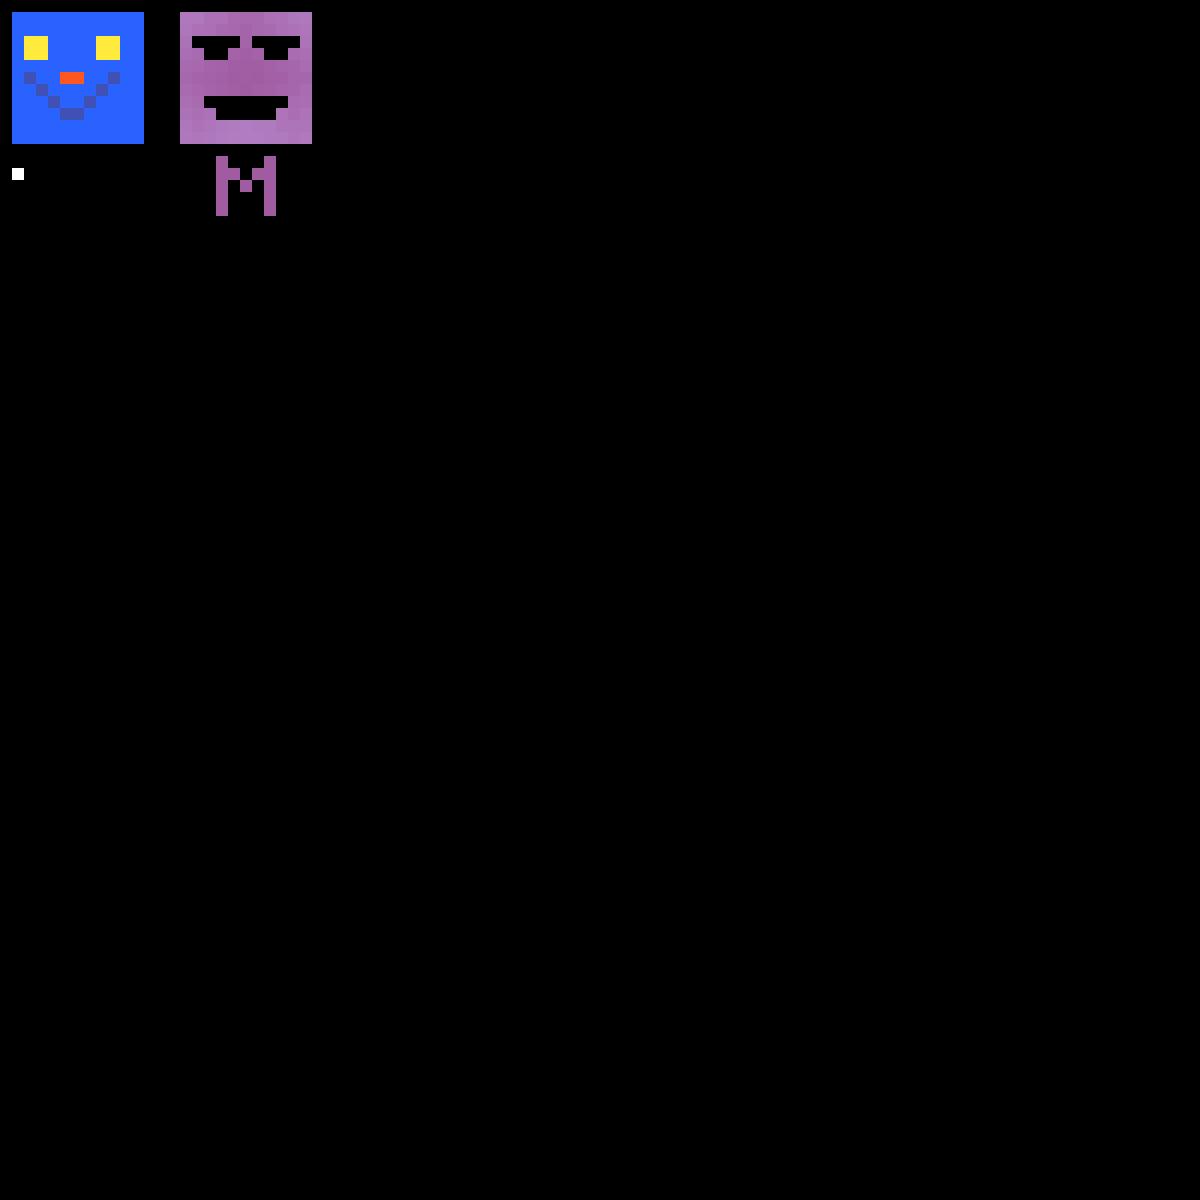 main-image-Add a Block!  by Smizy